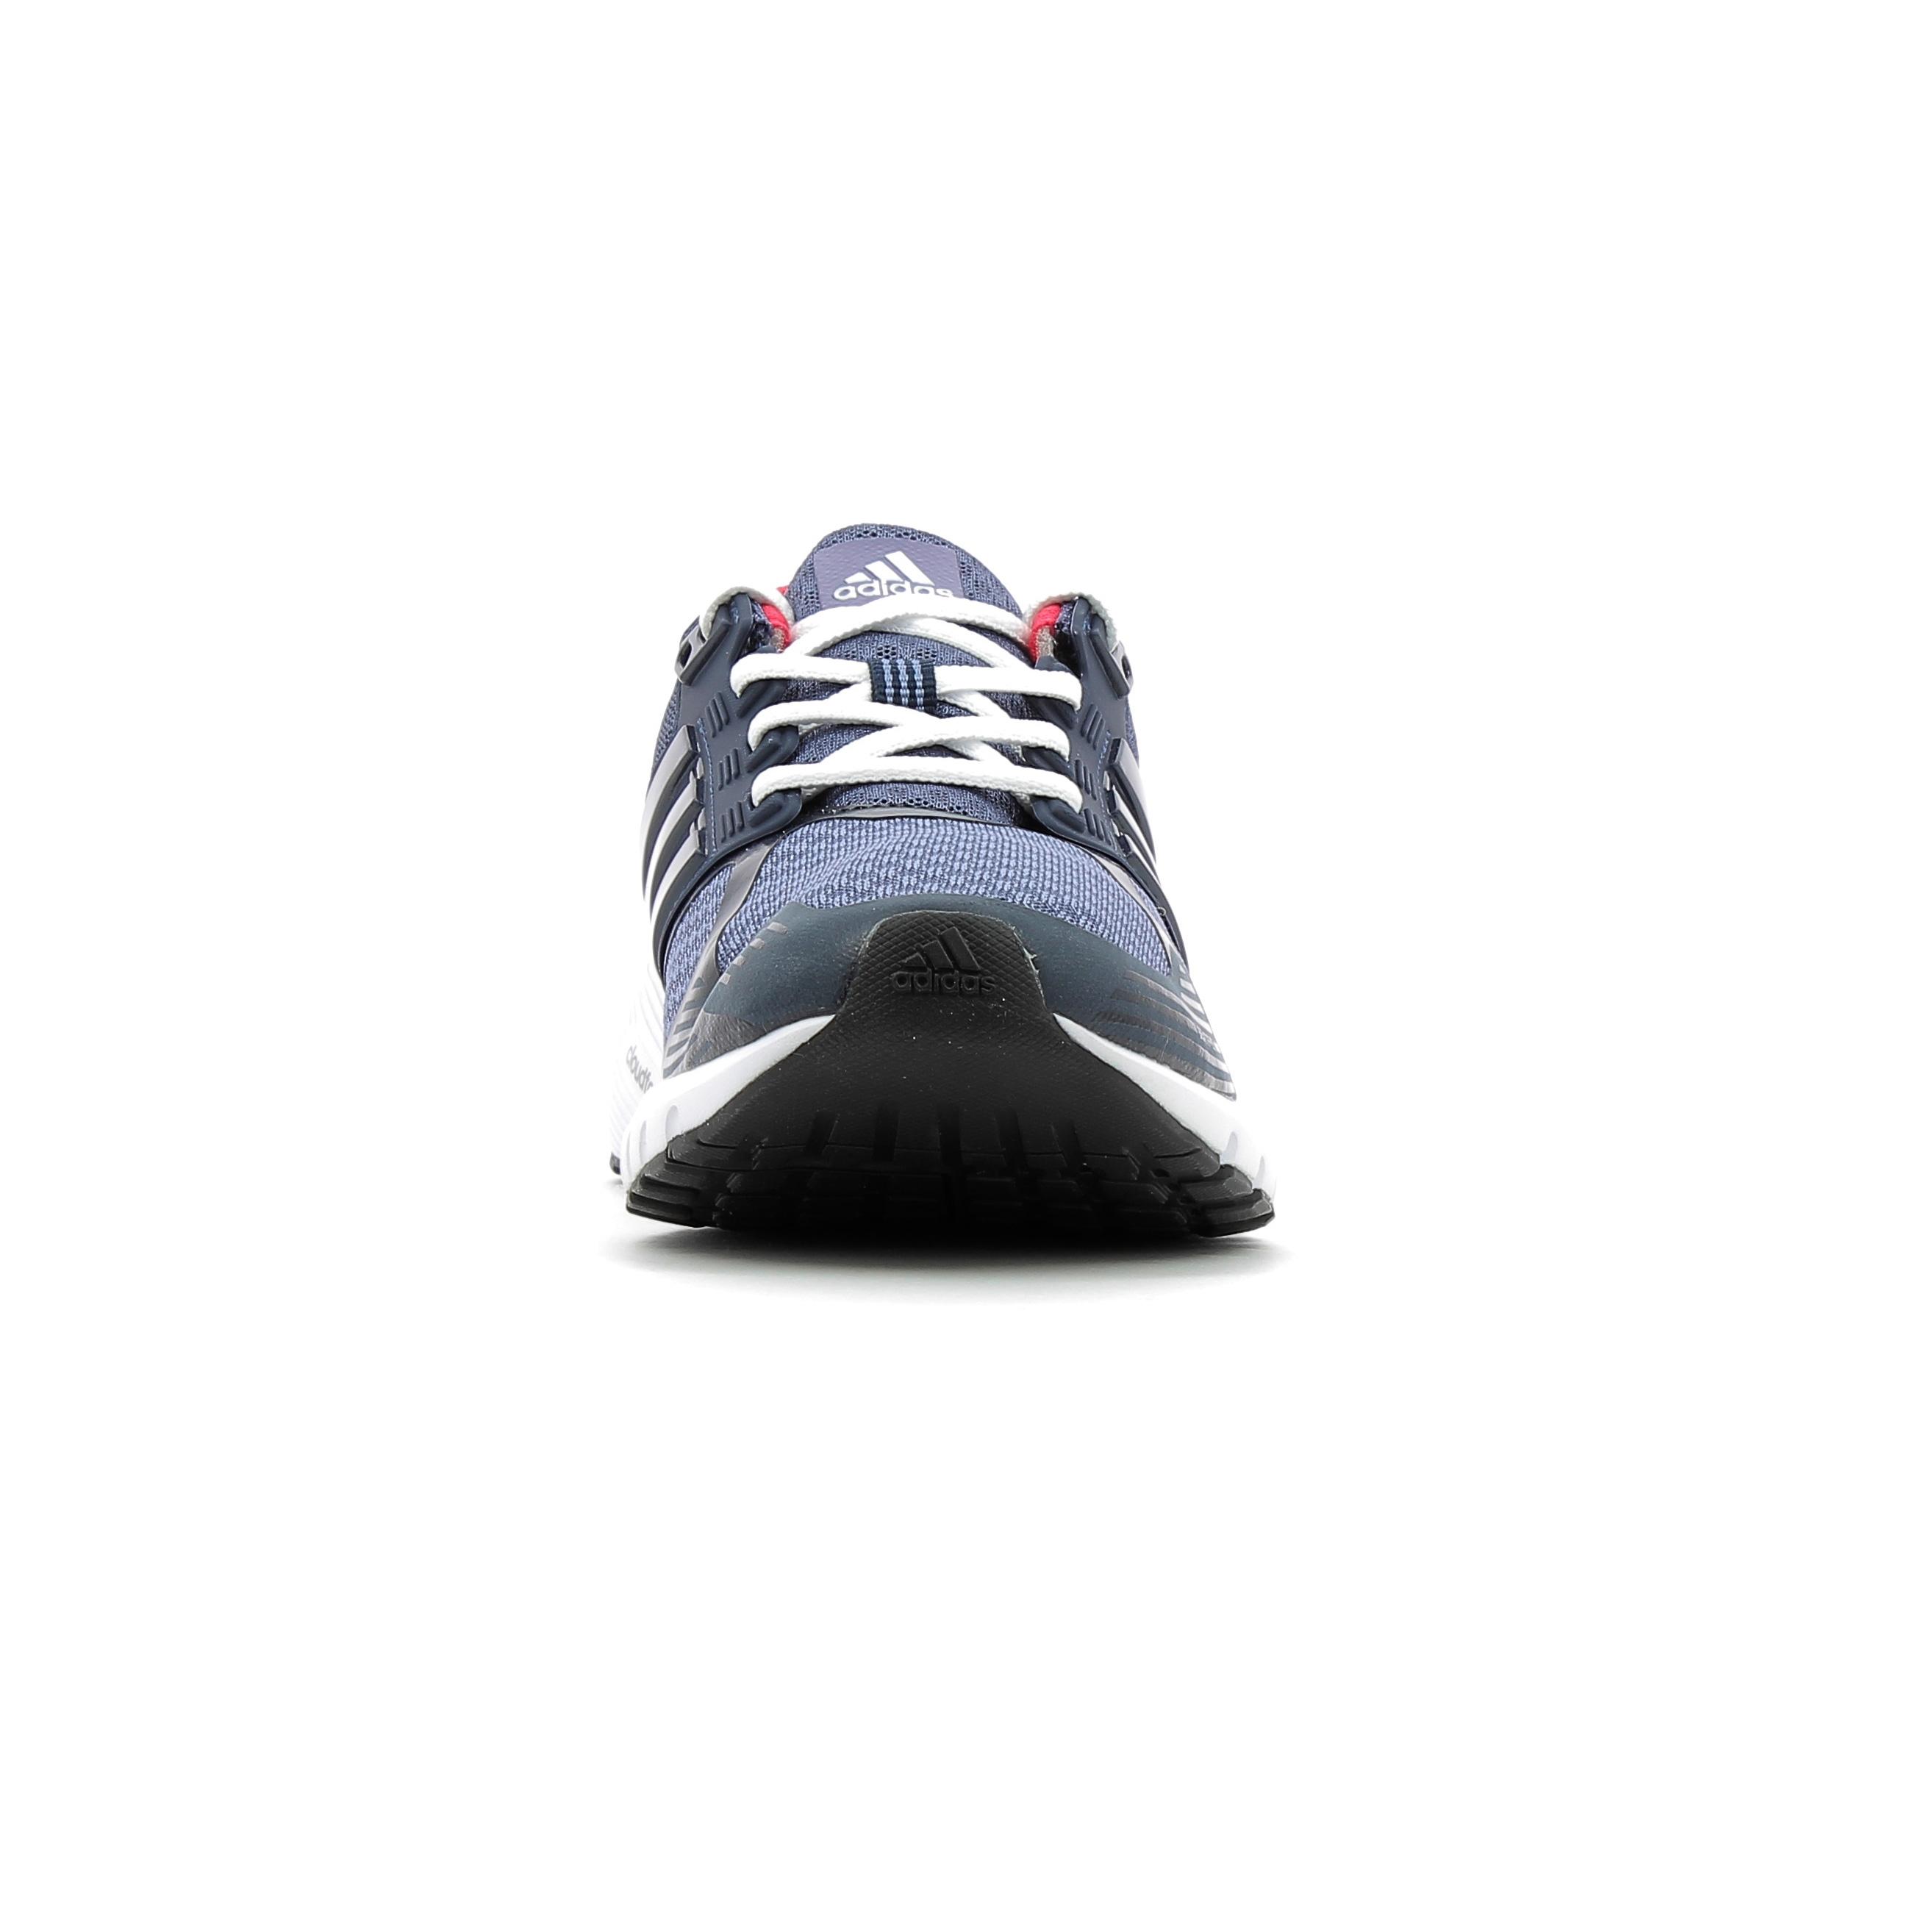 hot sale online 8c5ce 51bee Chaussure de running Adidas Performance Duramo 8 W